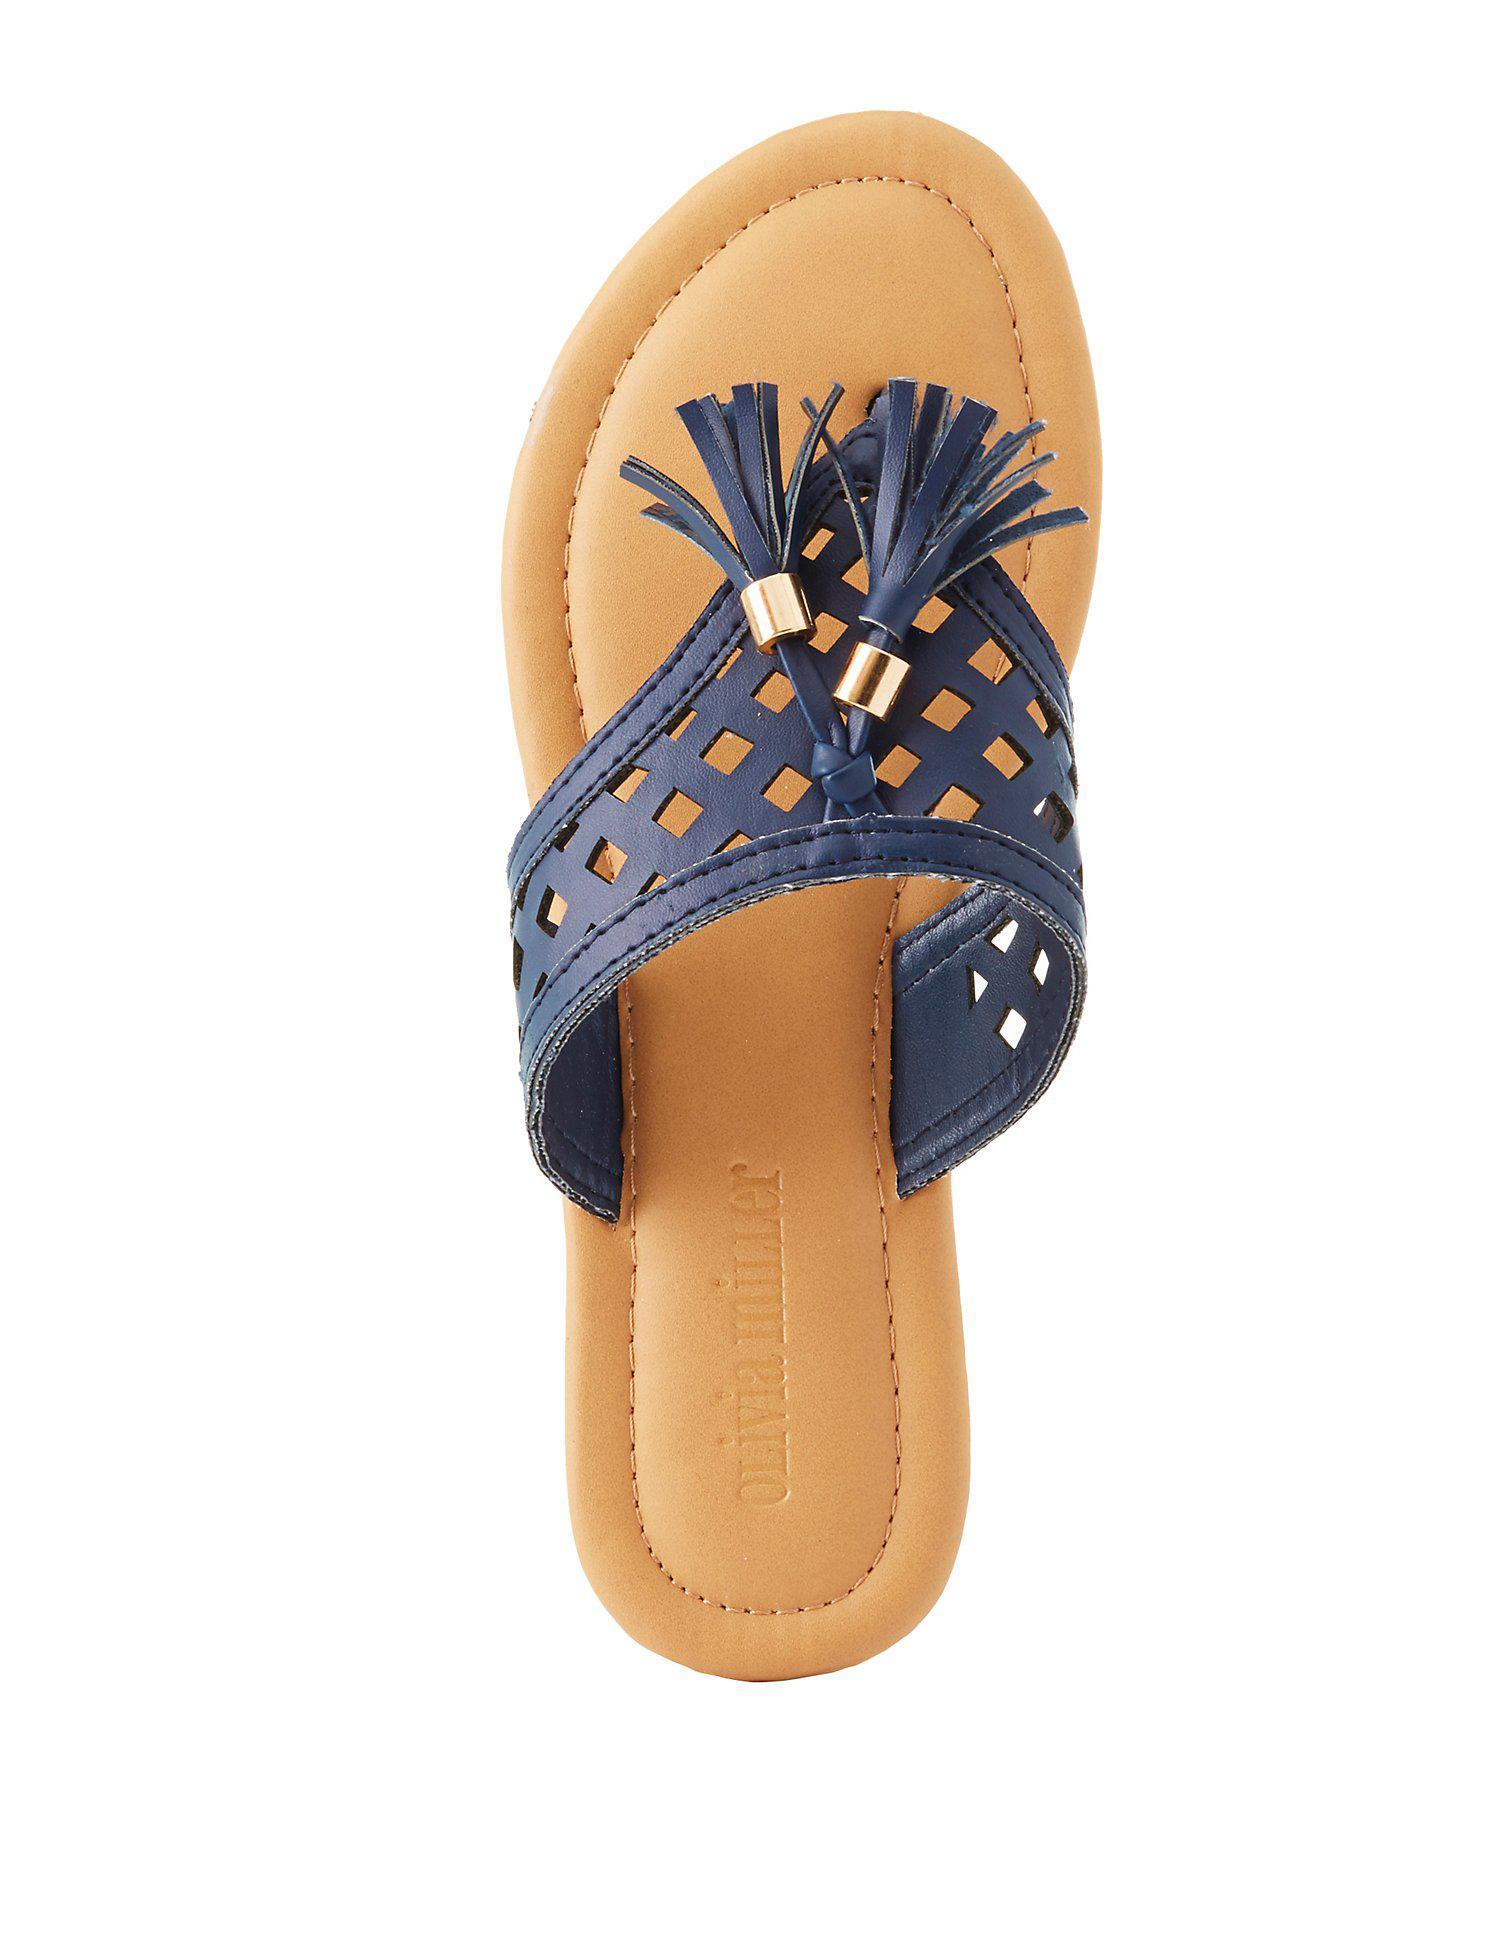 ede968fca Lyst - Charlotte Russe Laser Cut Tassel Thong Sandals in Blue